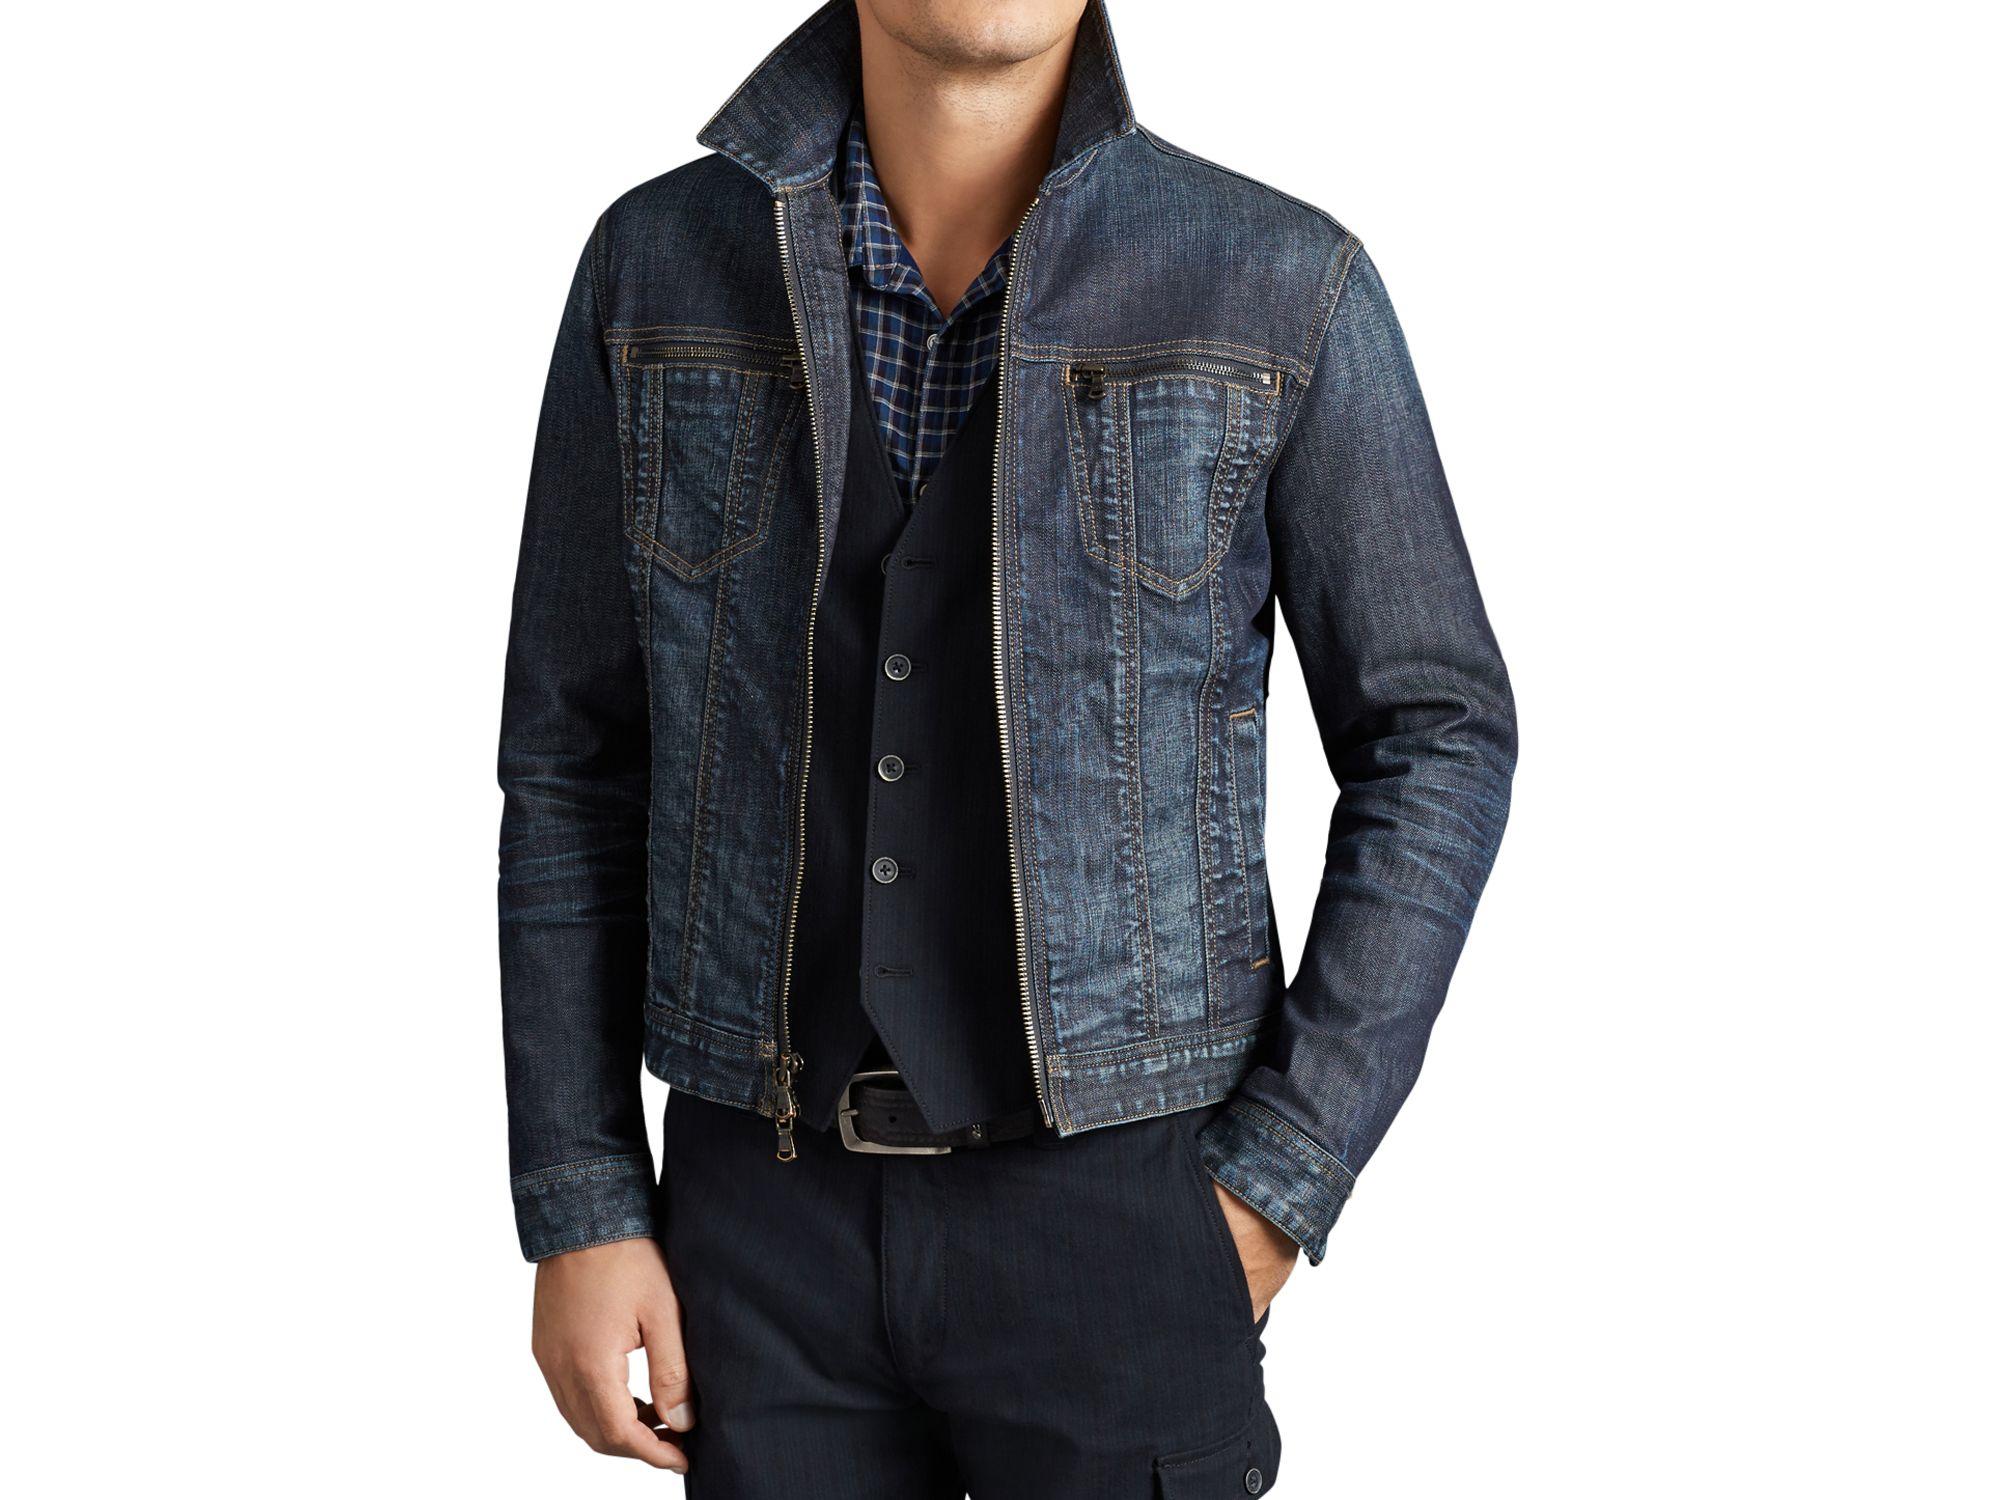 Lyst John Varvatos Zip Denim Jacket In Blue For Men